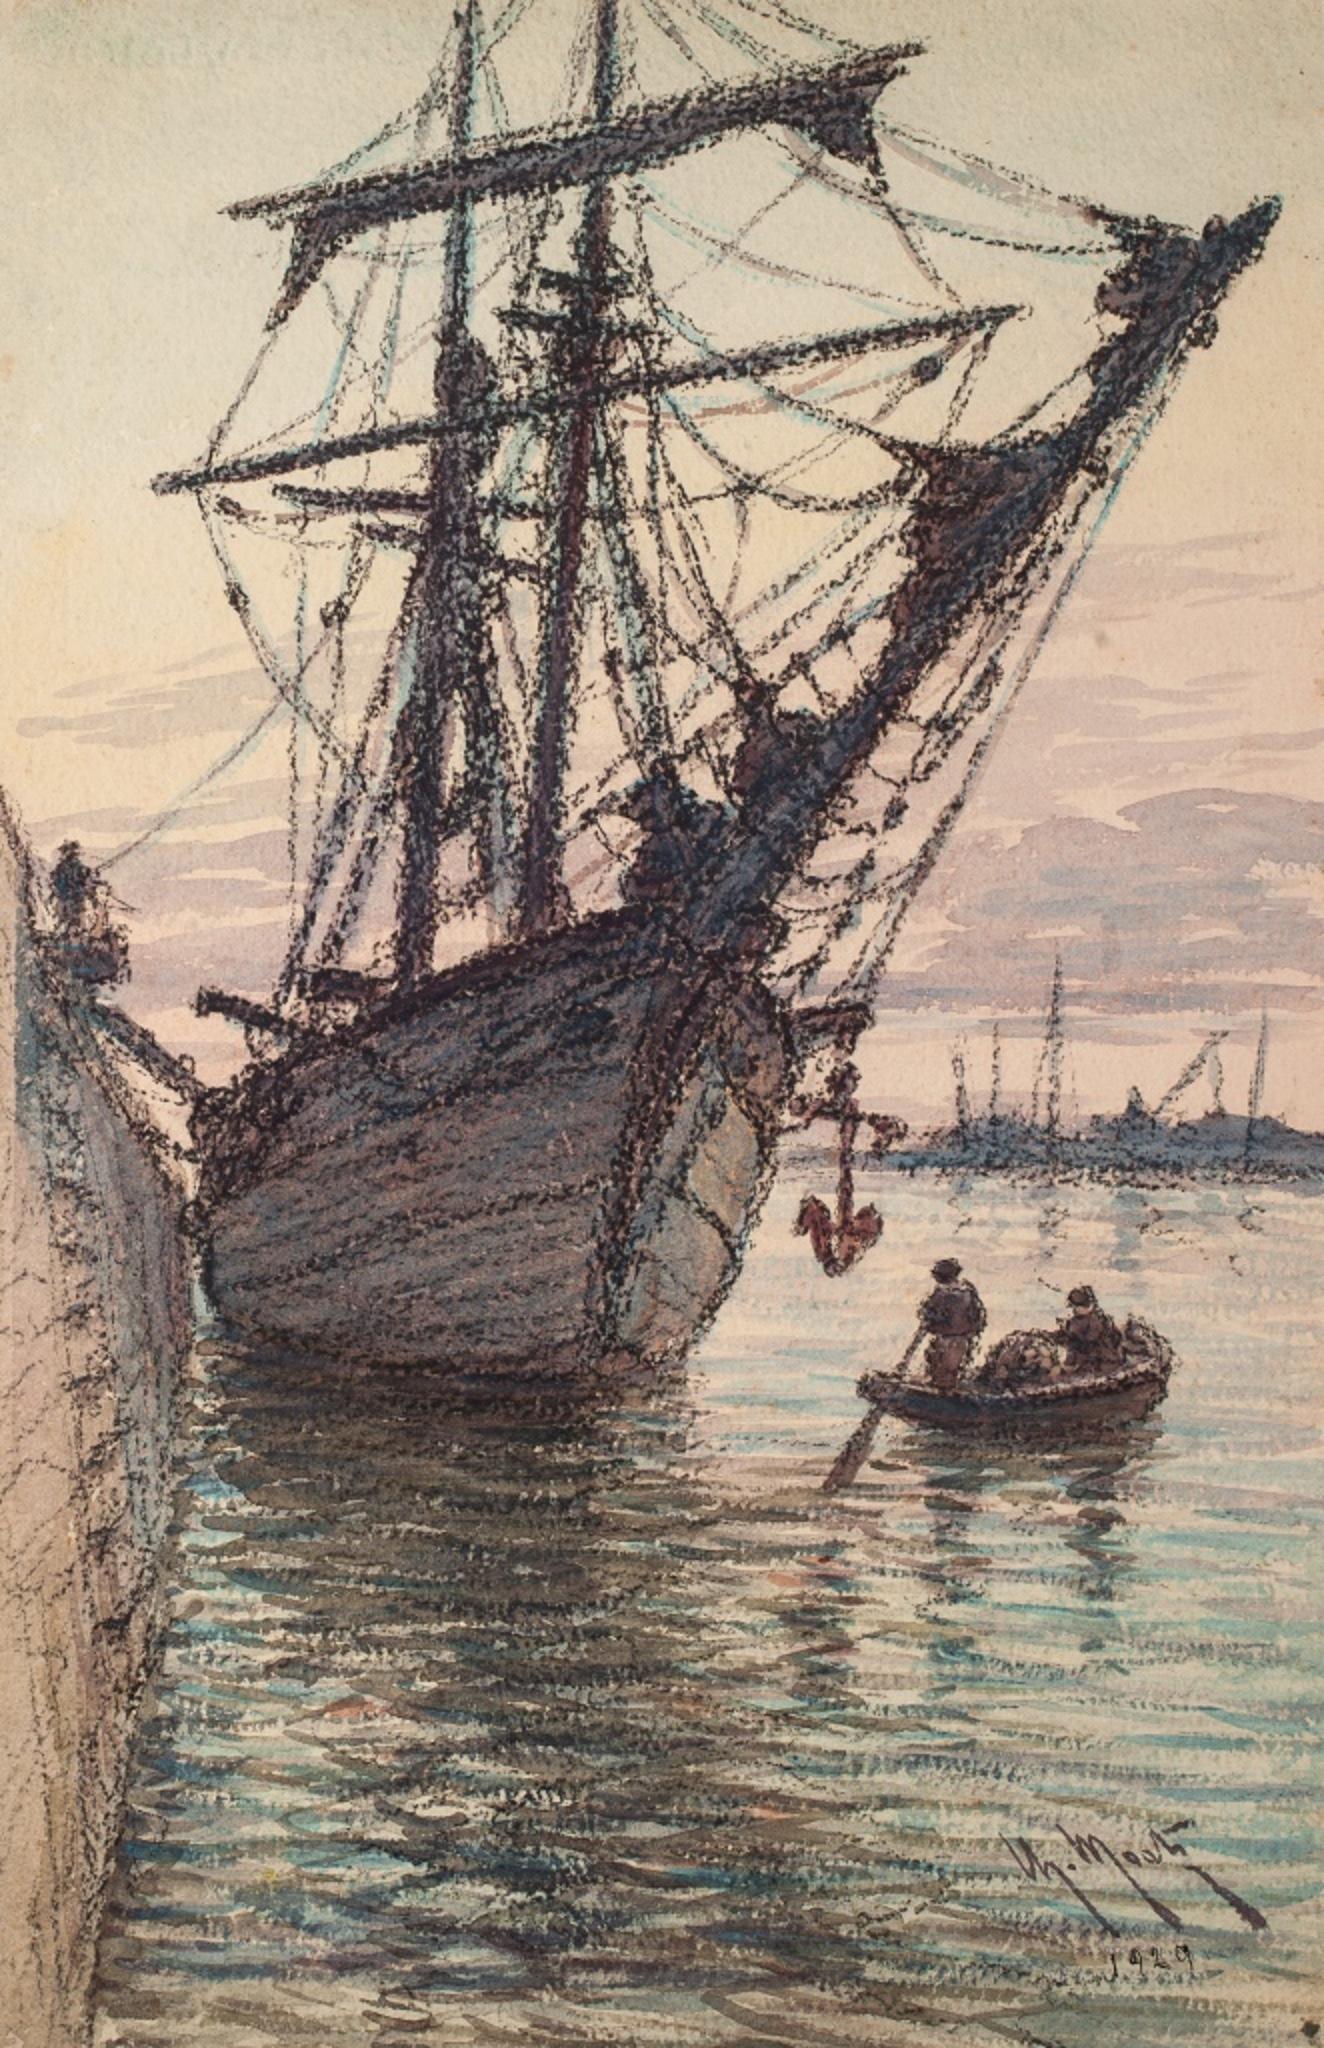 Sailing Ship in the Harbour - Original Watercolor  - 1929